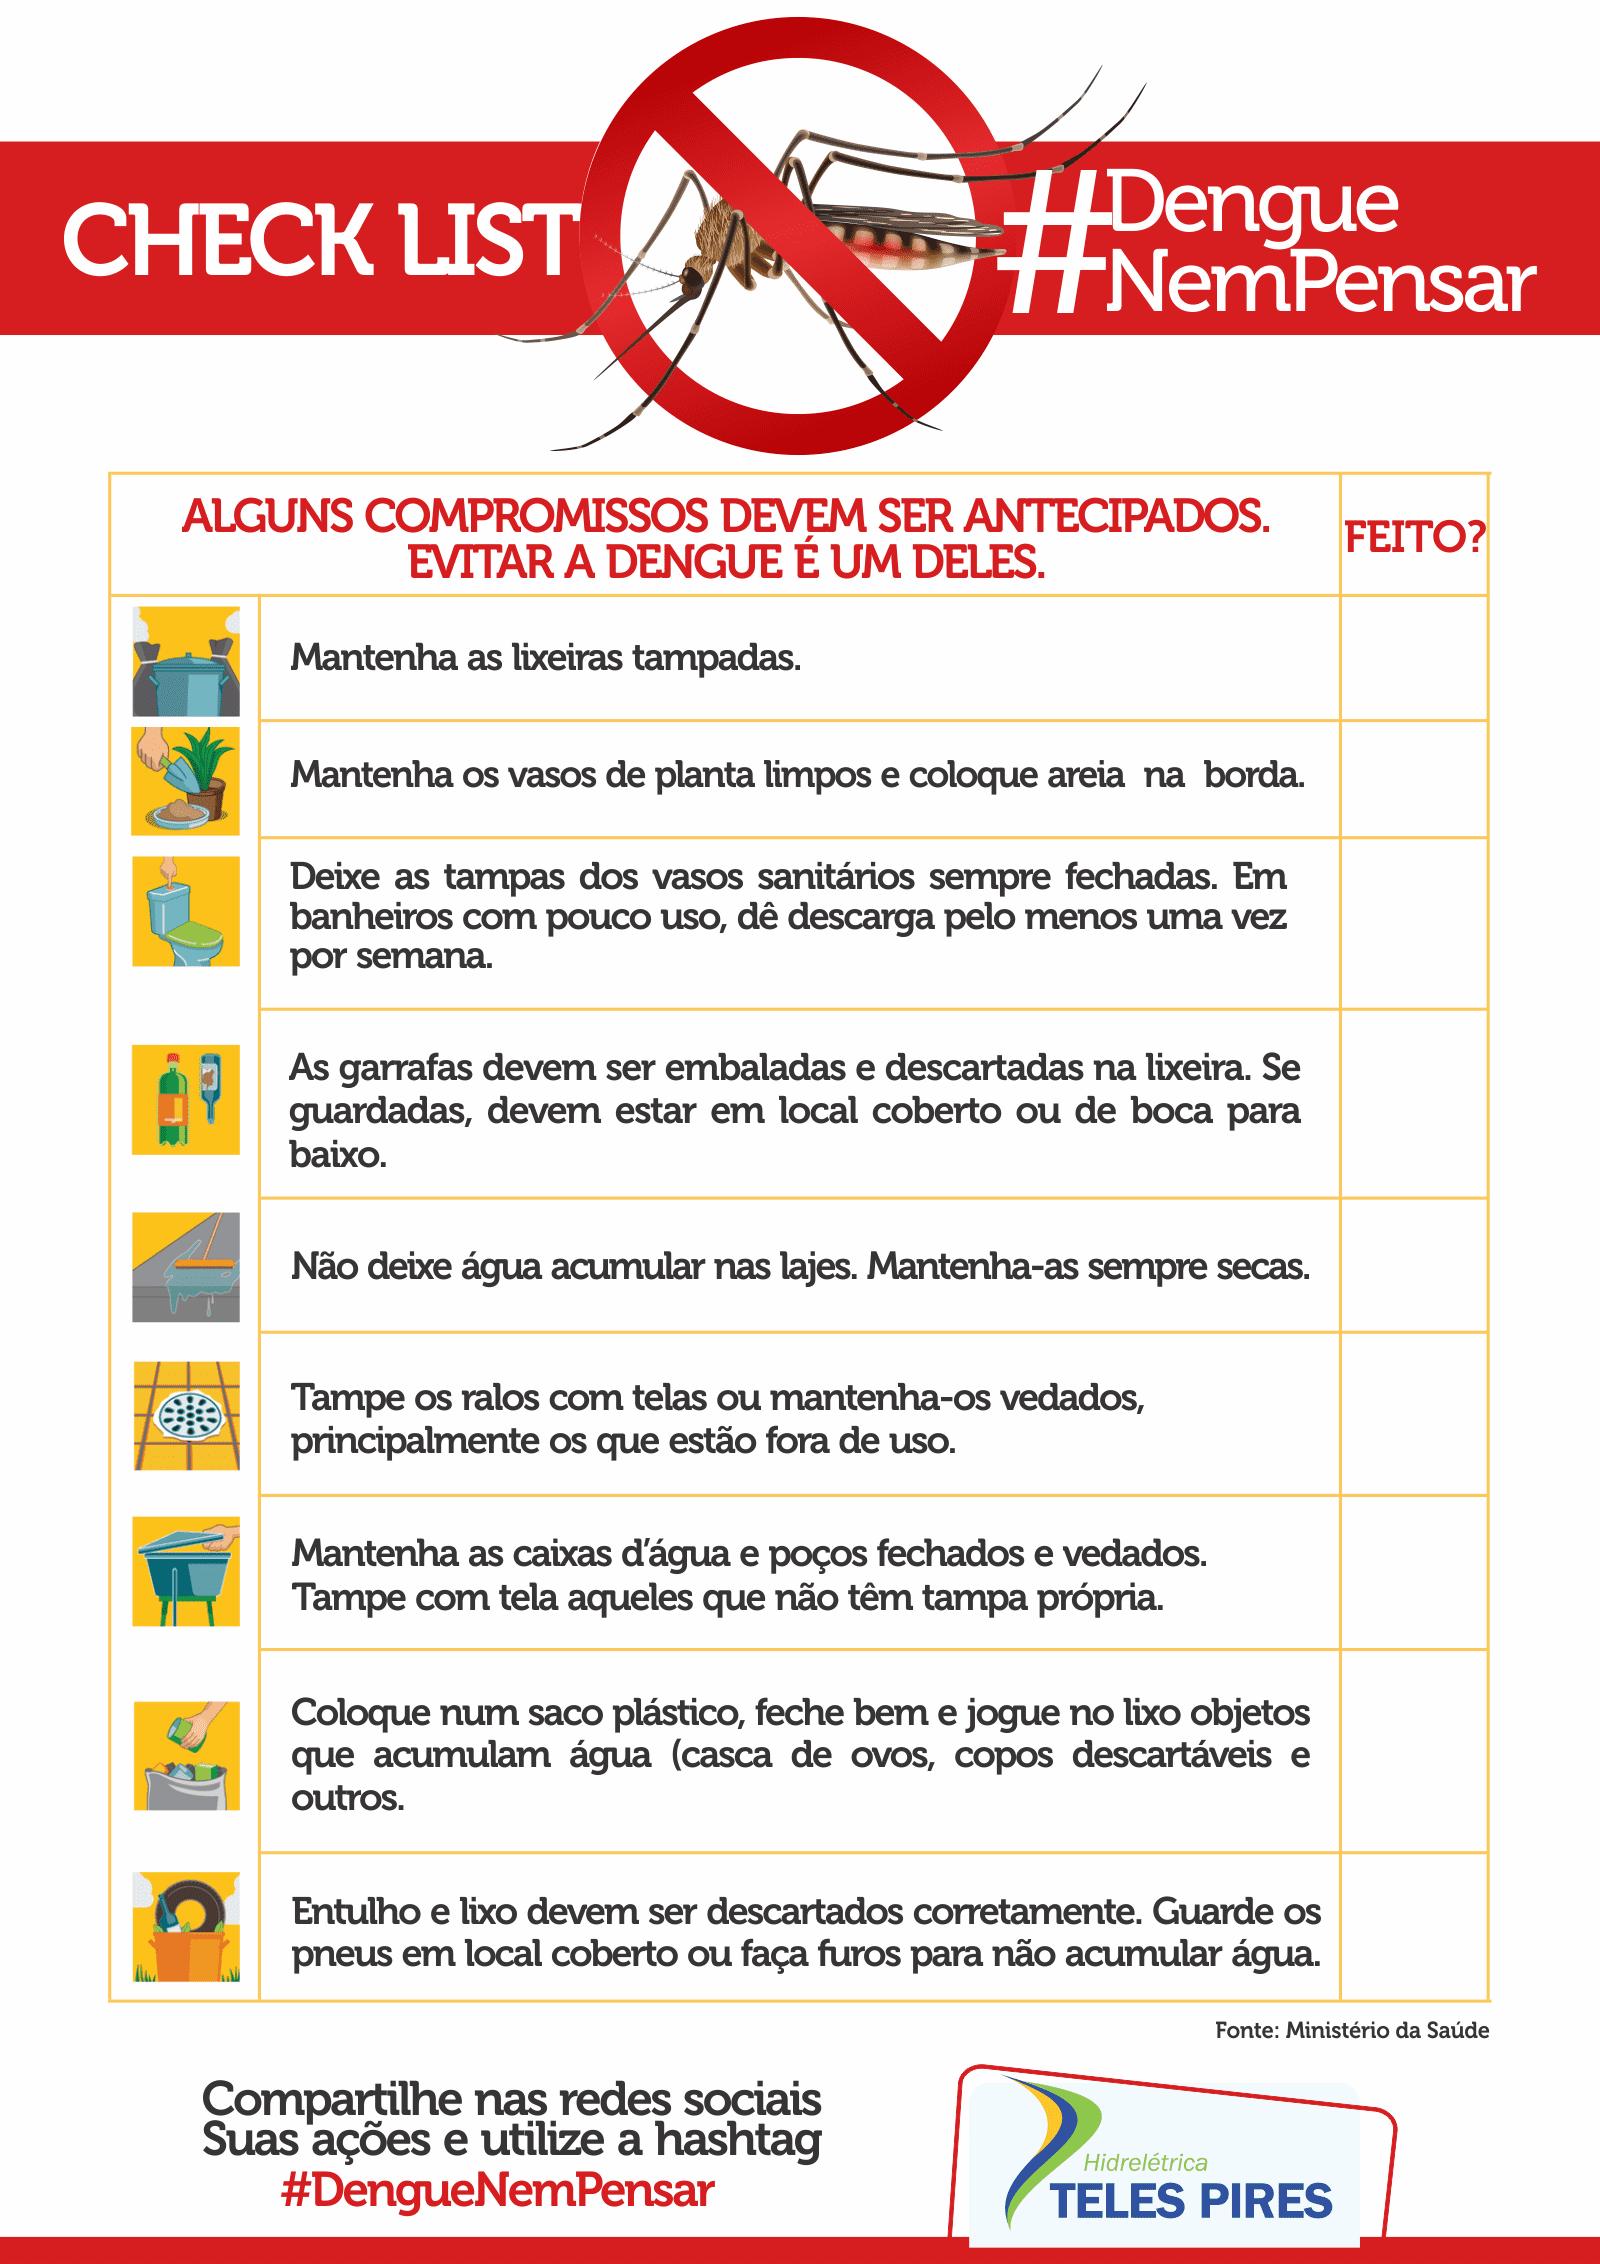 Campanha #DengueNemPensar